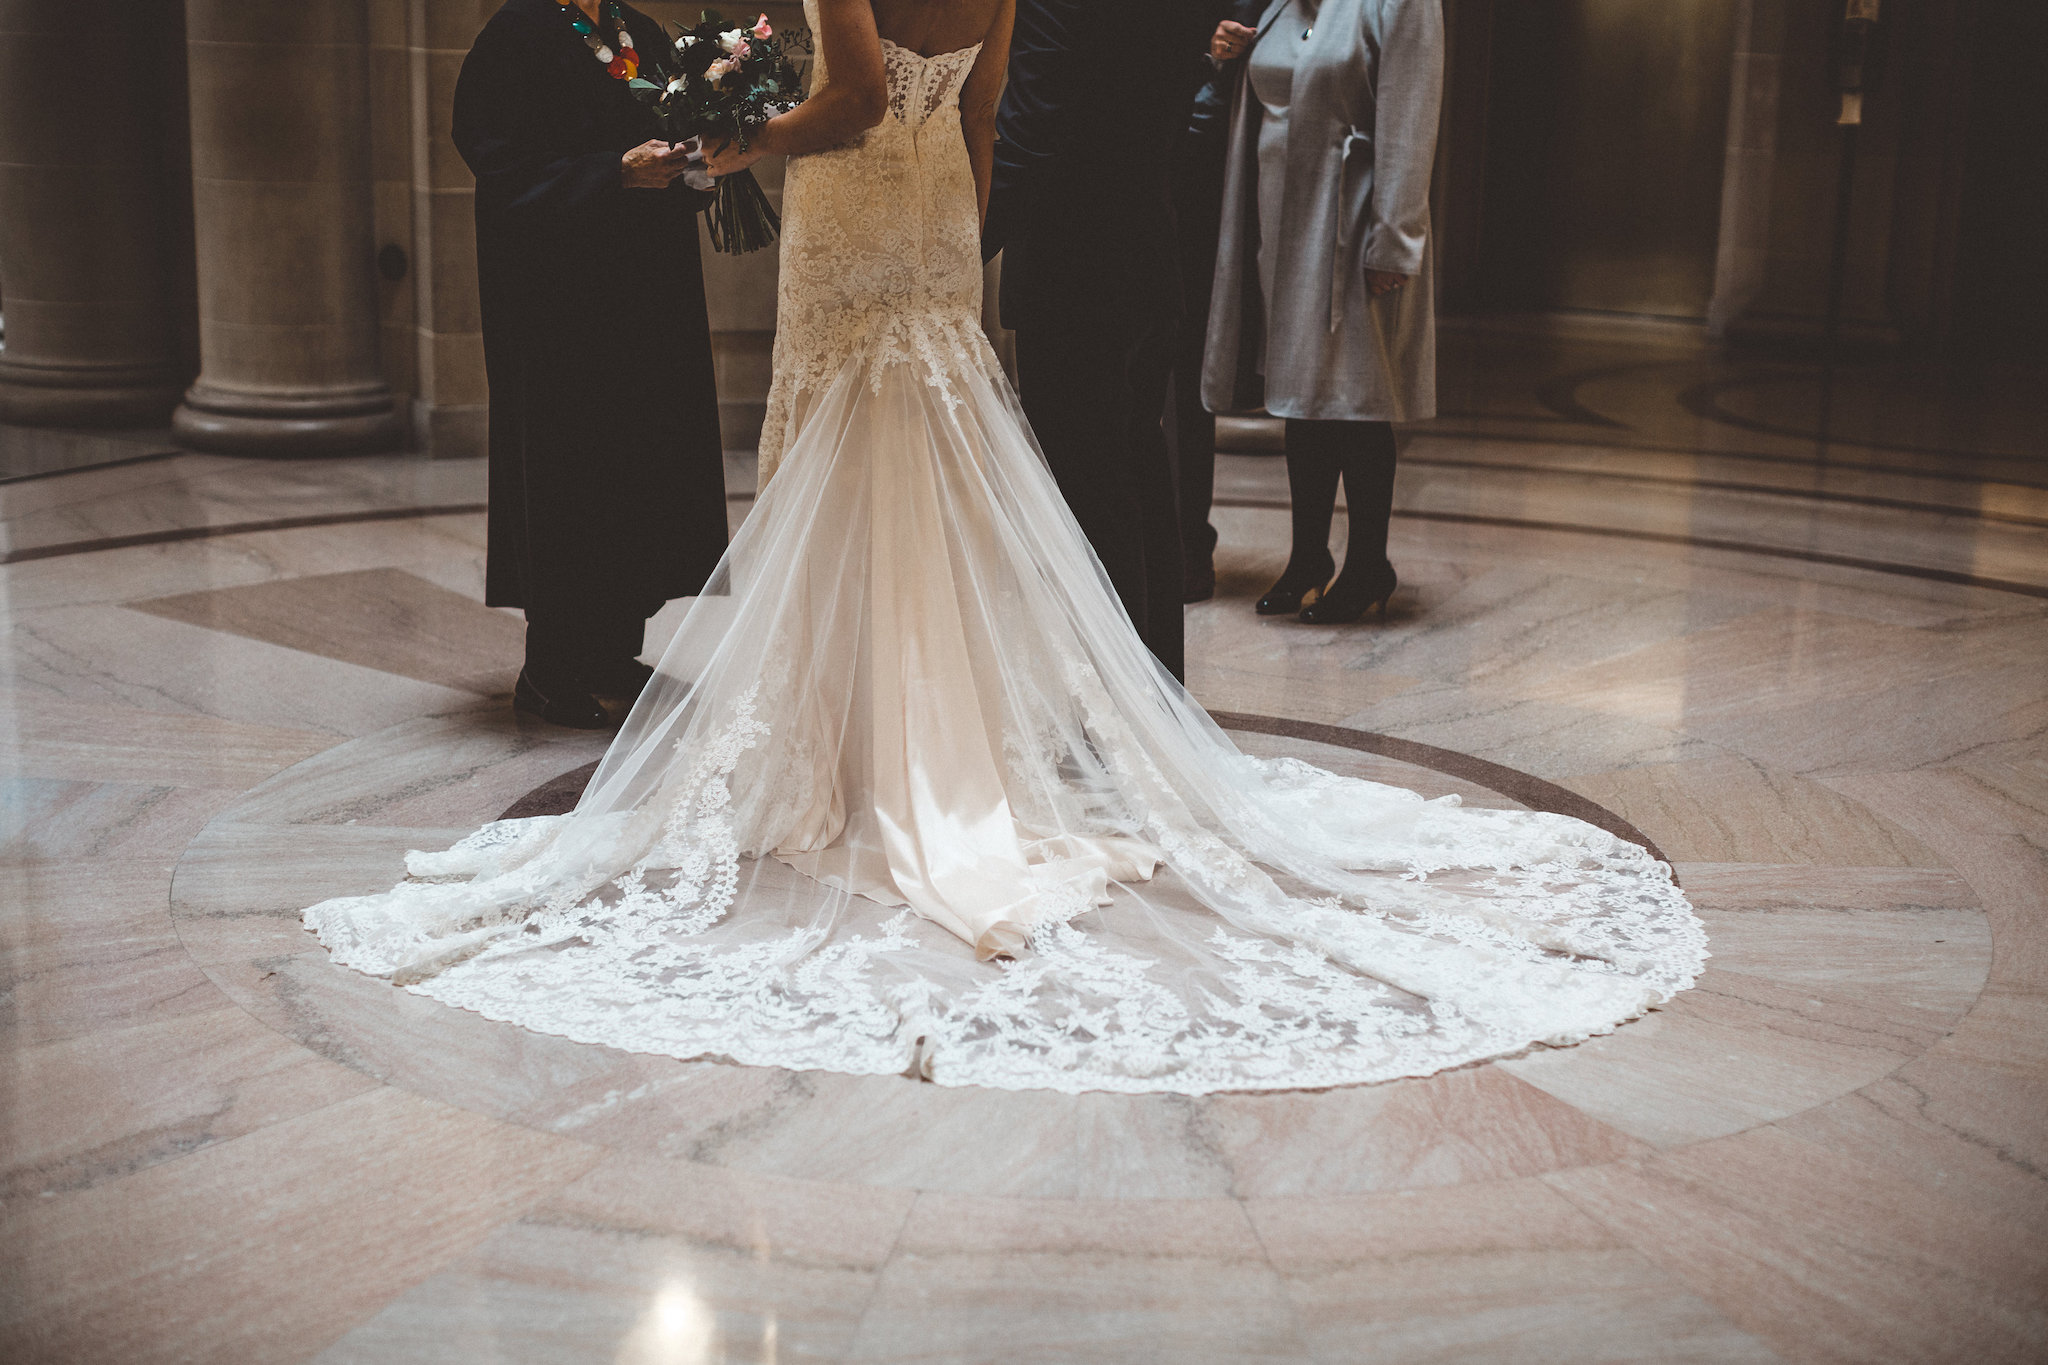 kris-and-andreas-san-francisco-elopement-adventure24.jpg